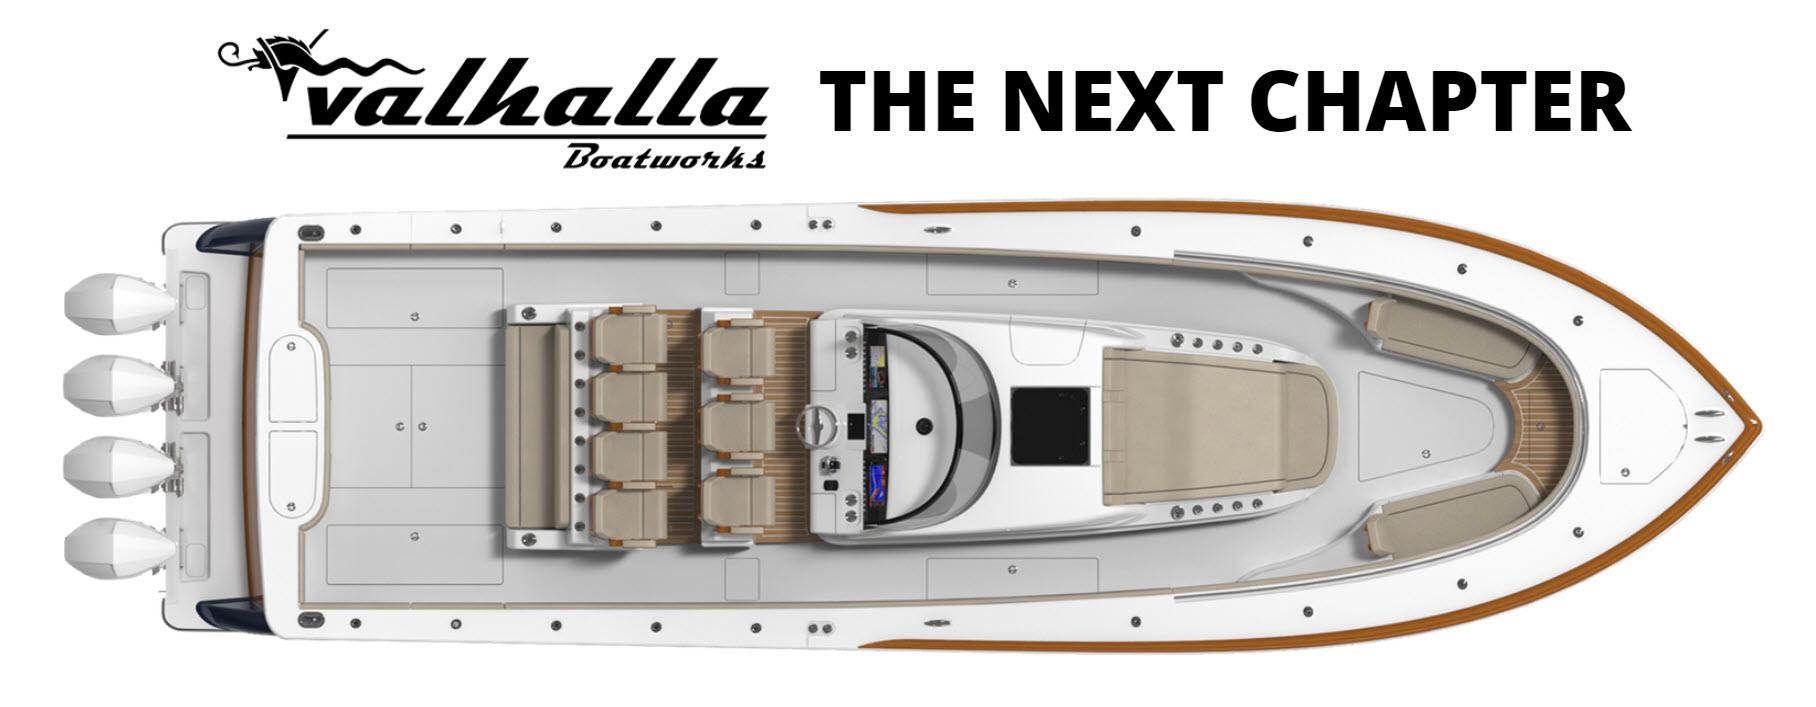 Valhalla V-46 Announcement